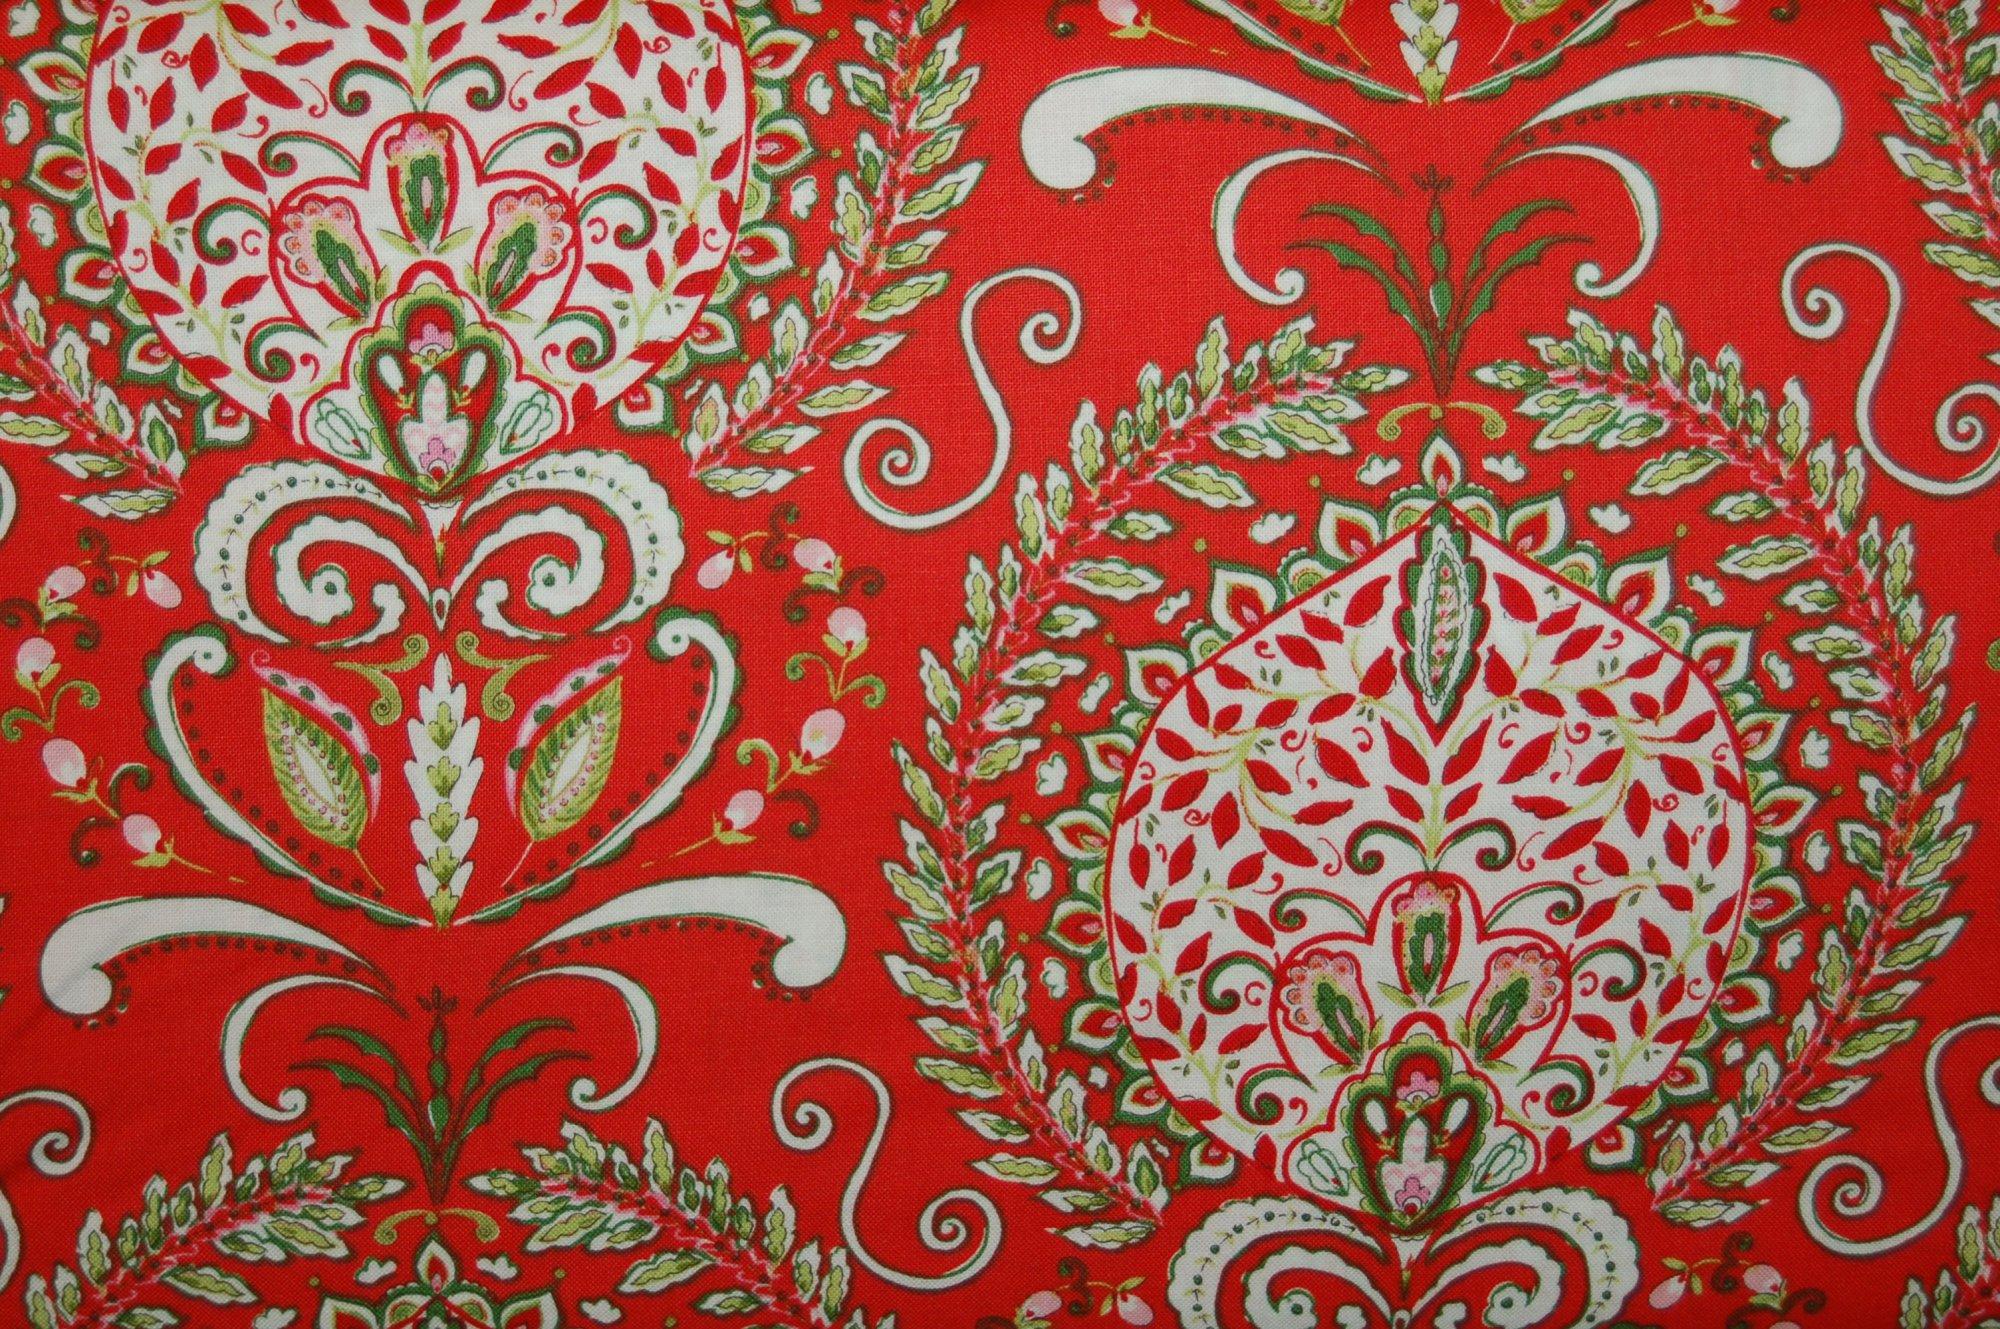 Merry Mistletoe - Peyton (Red) from Dena Designs for Free Spirit